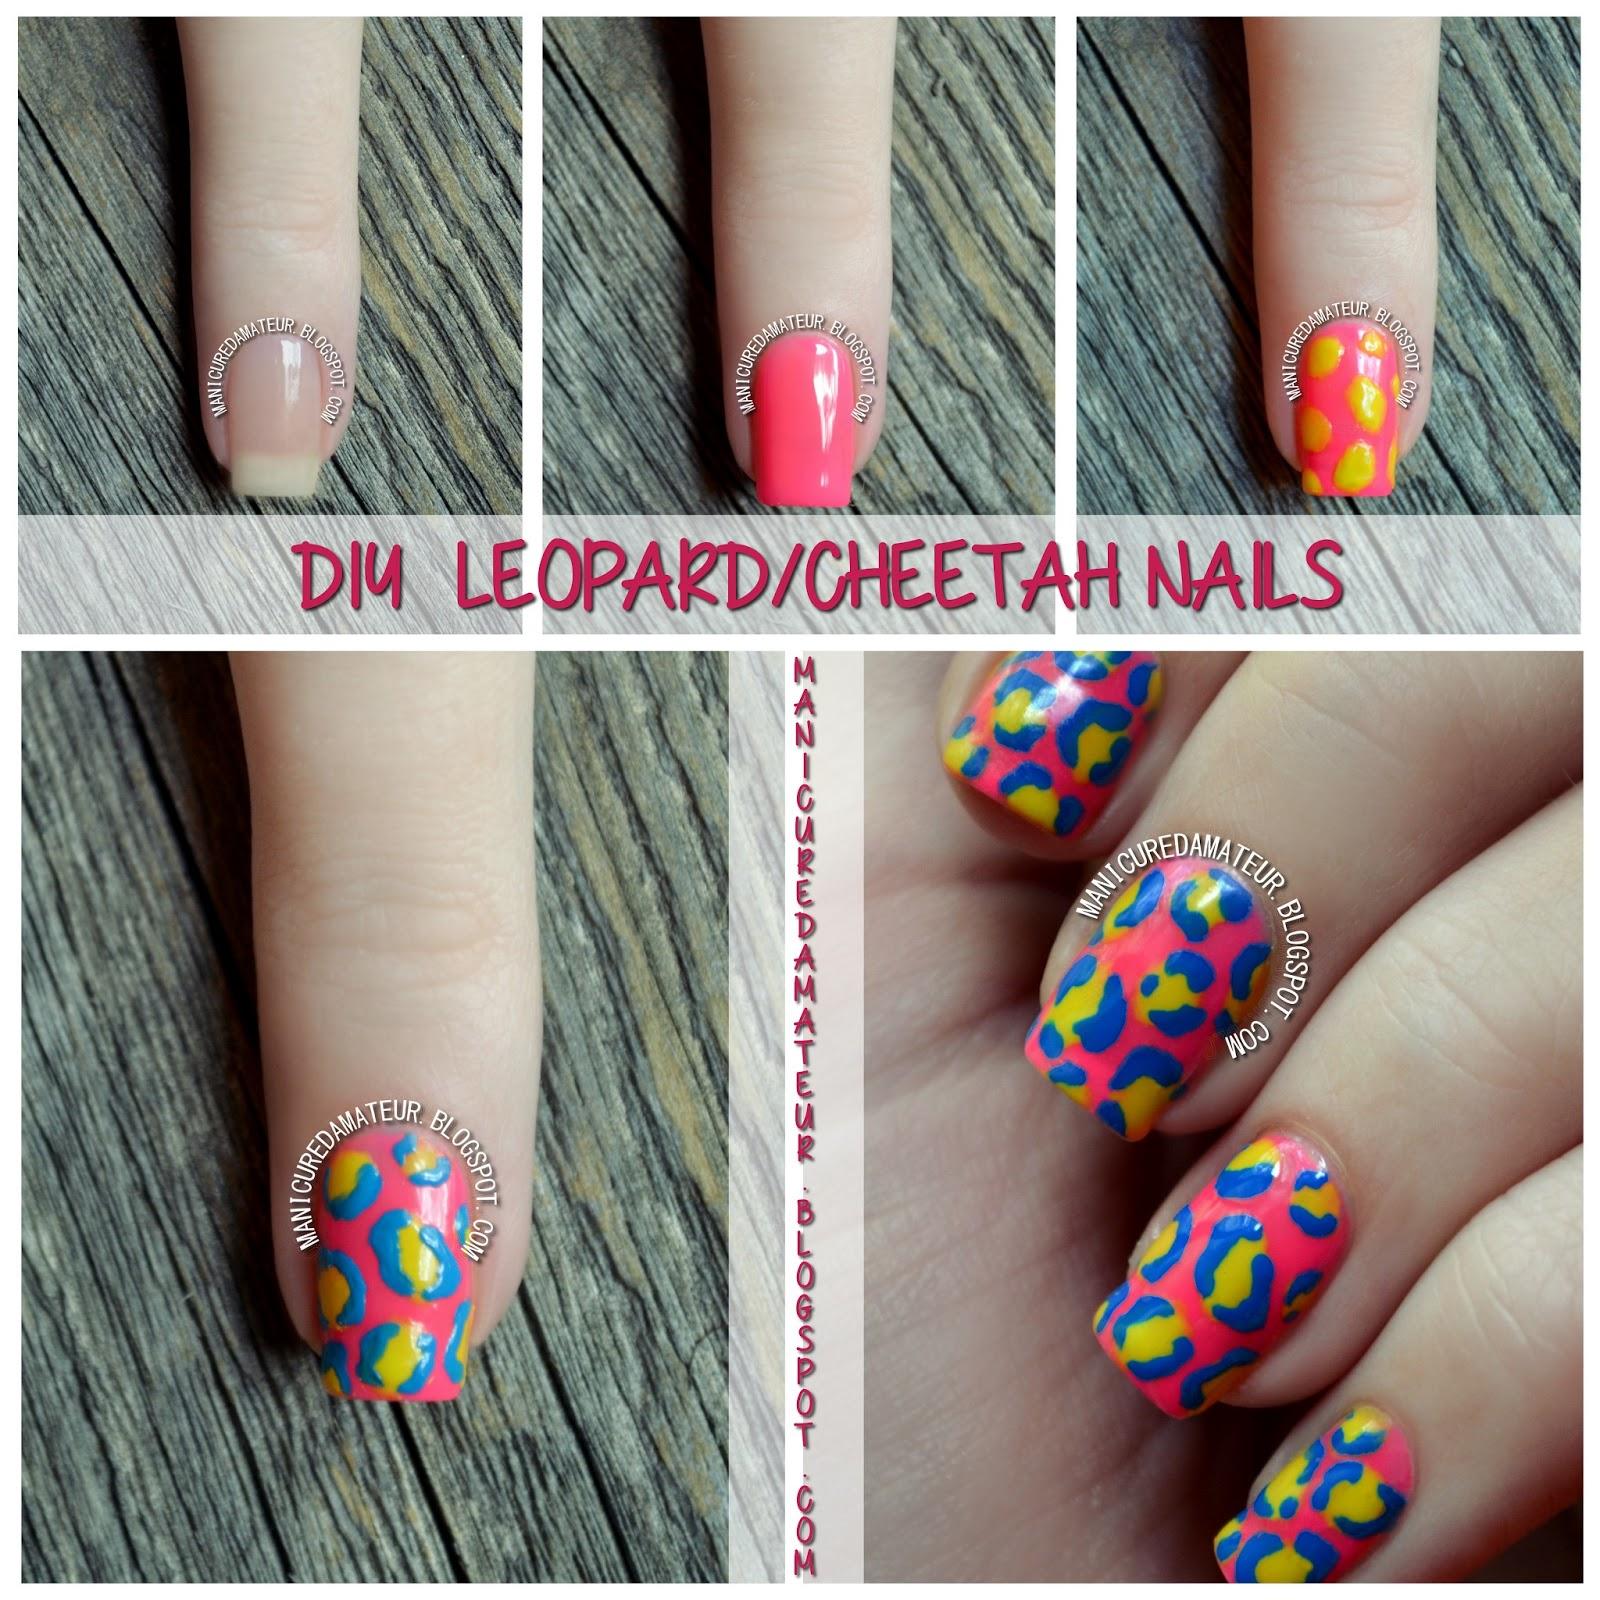 Diy Snow Leopard Nail Art: The Manicured Amateur: L.A. Girl DIY Nail Art Review Part